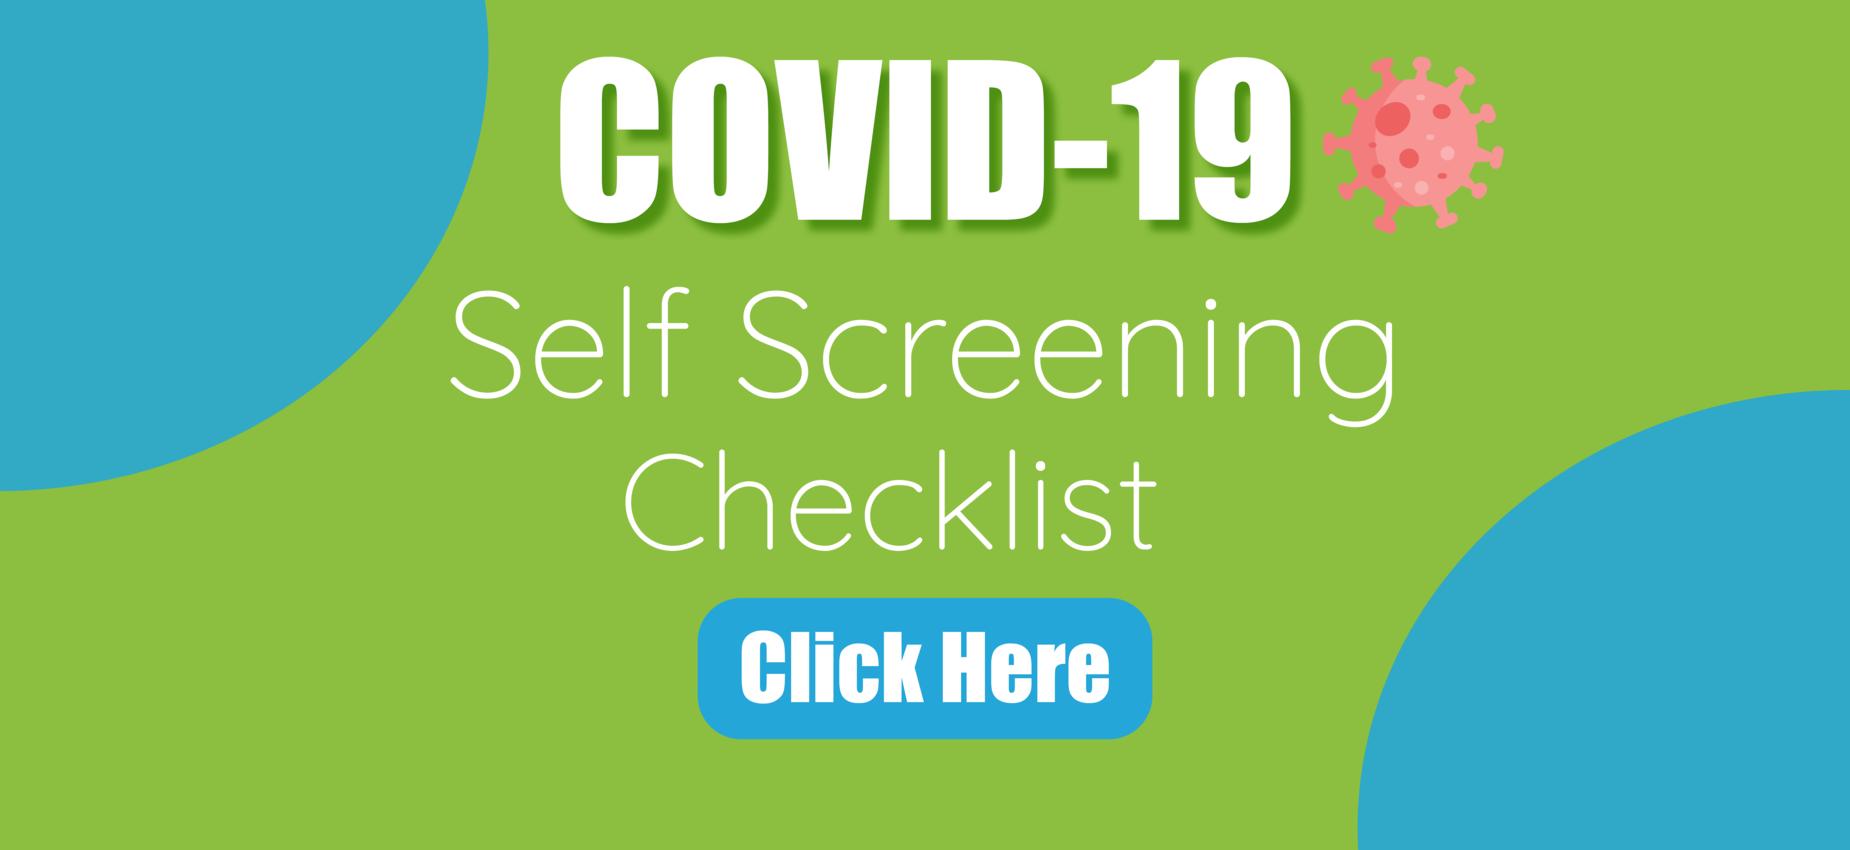 Self Screening Checklist